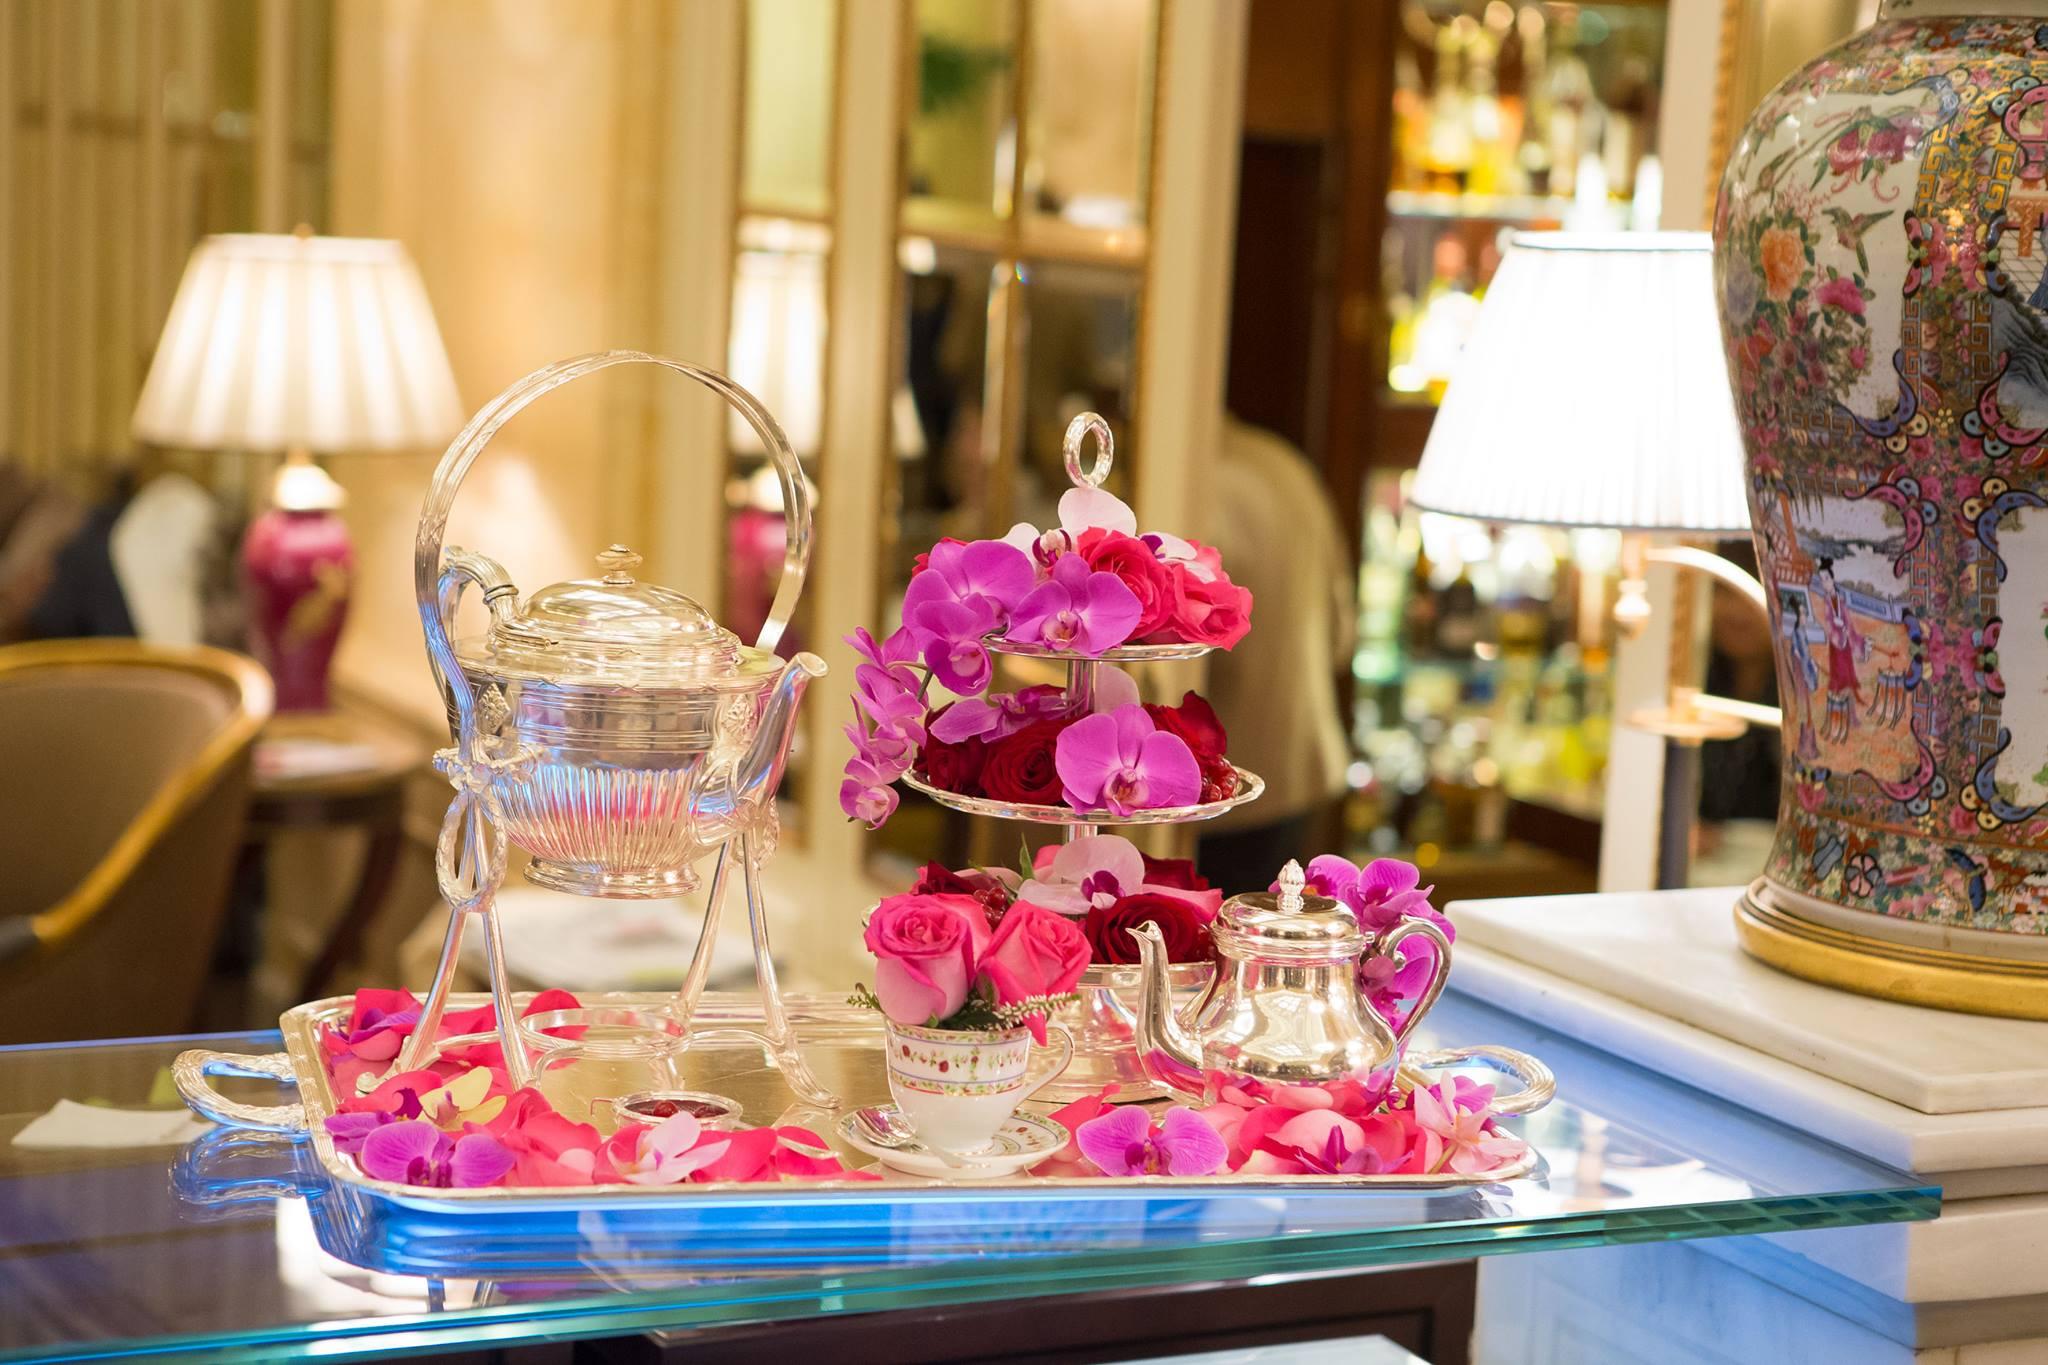 La hora del té es sagrada en el Ritz. Foto: Hotel Ritz.